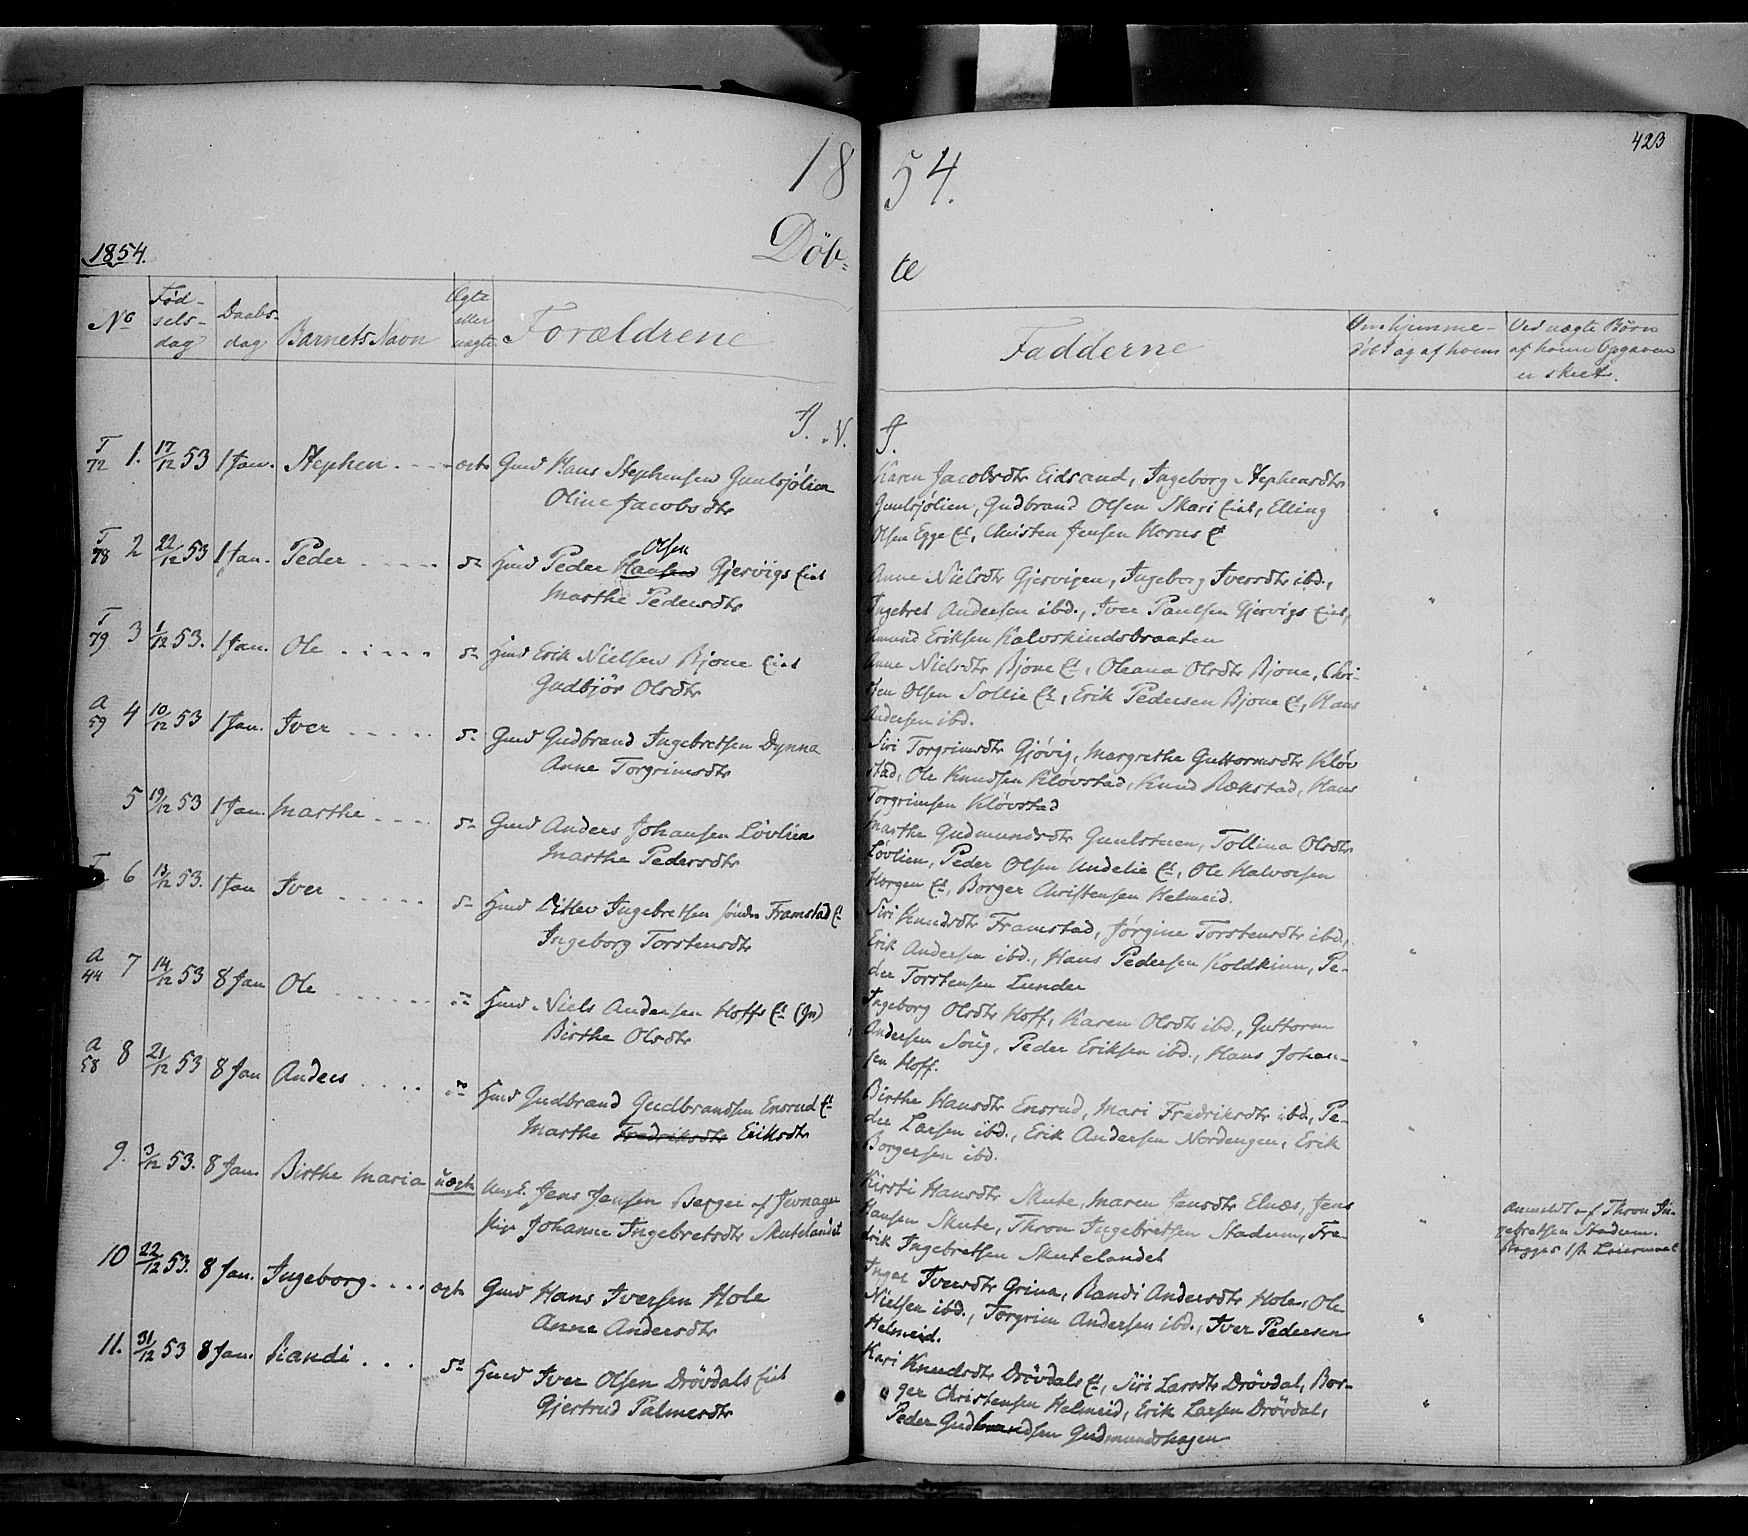 SAH, Gran prestekontor, Ministerialbok nr. 11, 1842-1856, s. 422-423